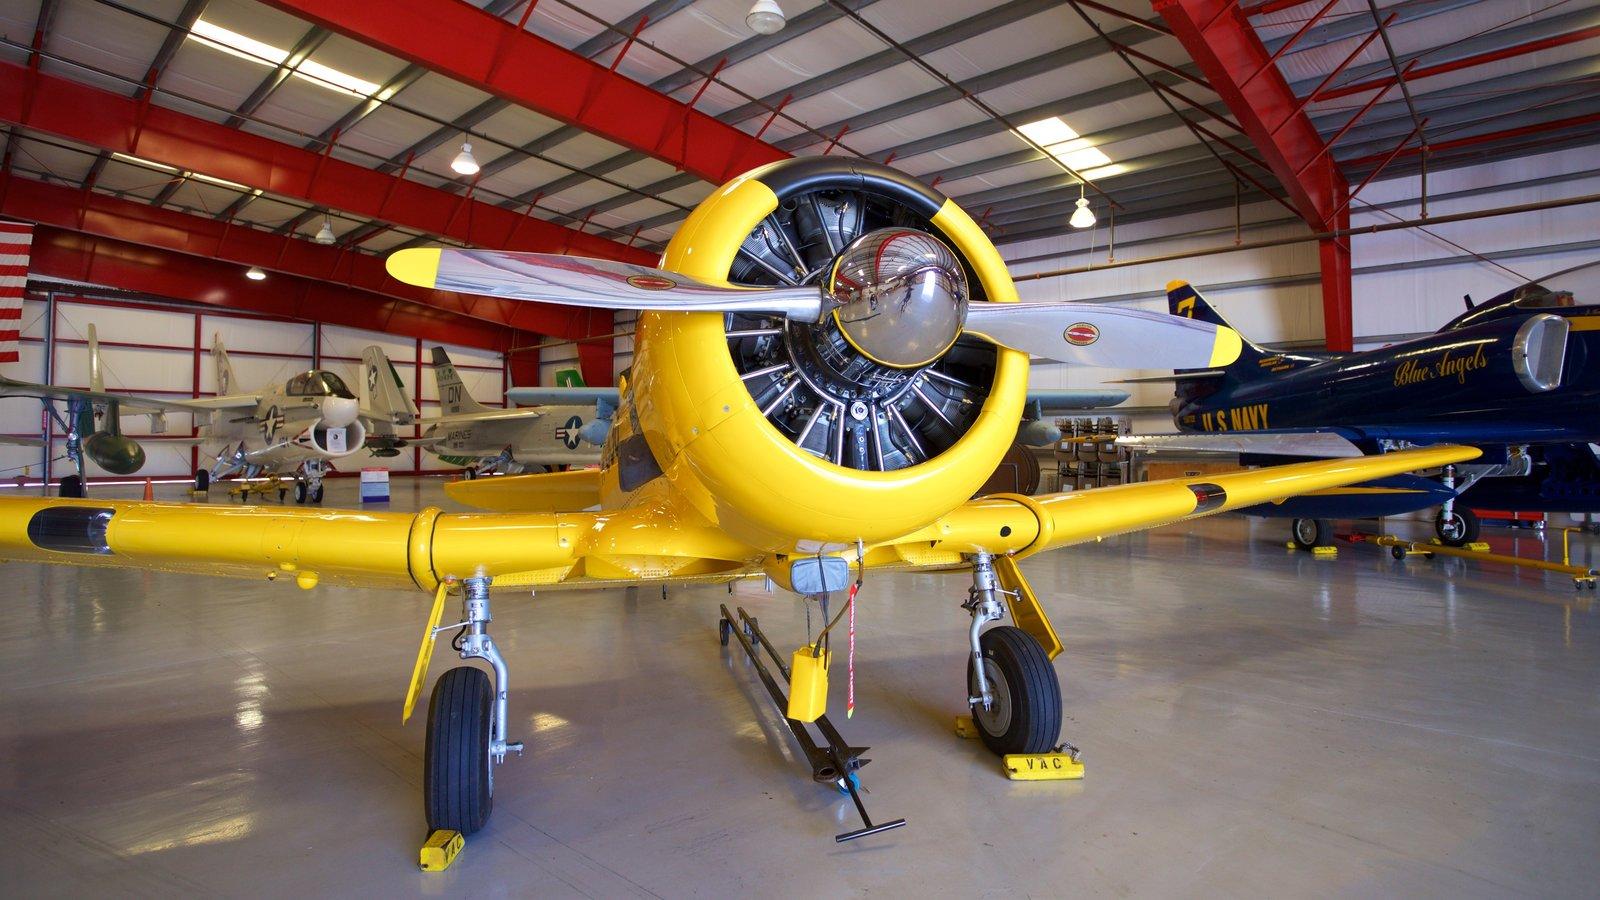 Valiant Air Command Warbird Museum showing interior views